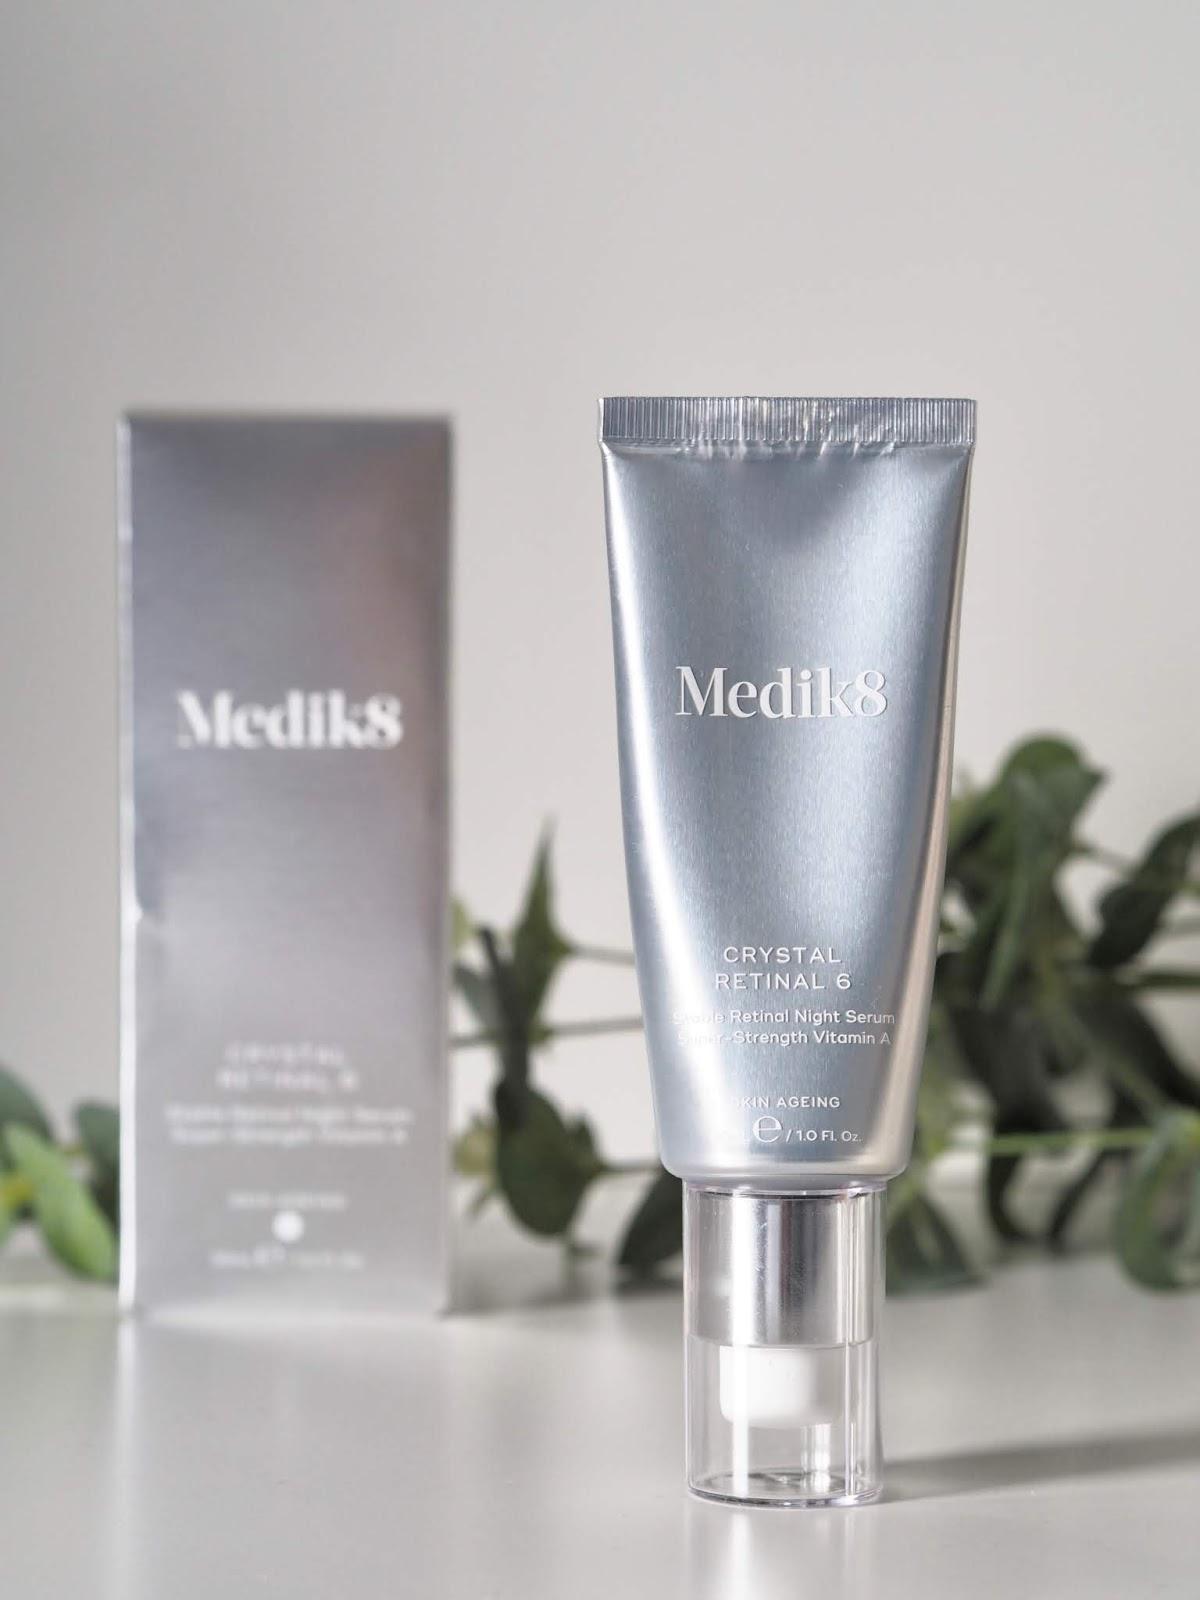 Medik8.crystal.retinal.review